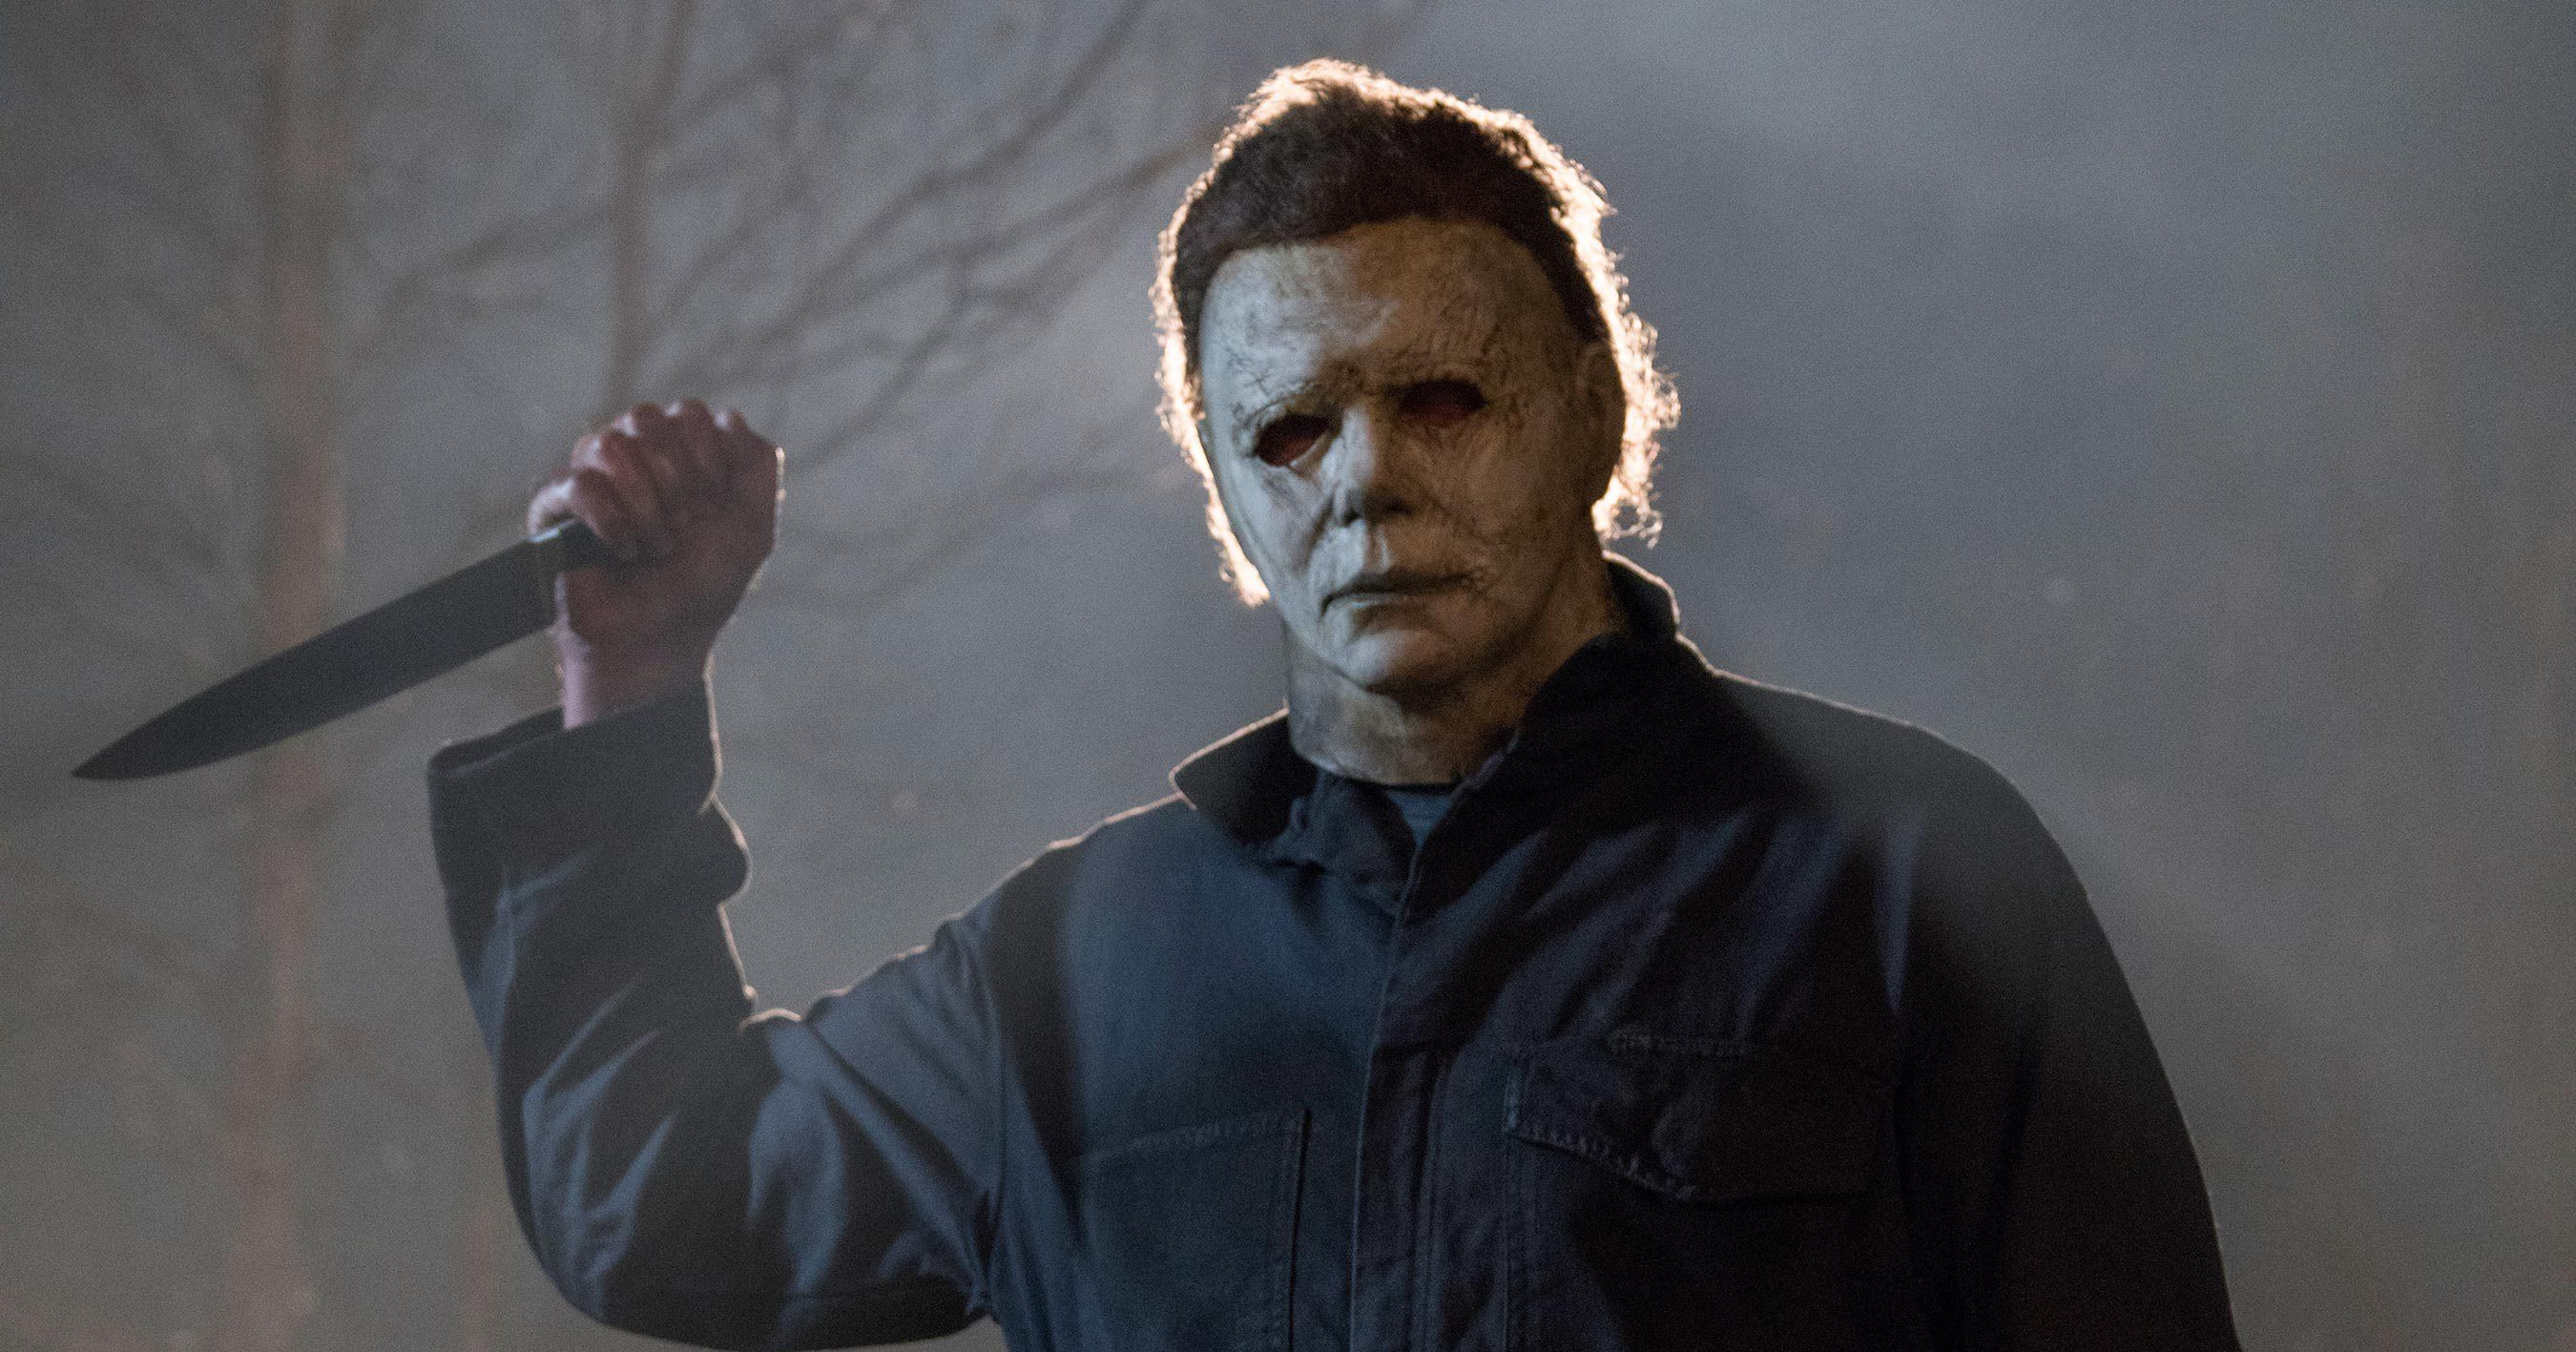 Halloween masked maniac Michael Myers stalks suburbia in